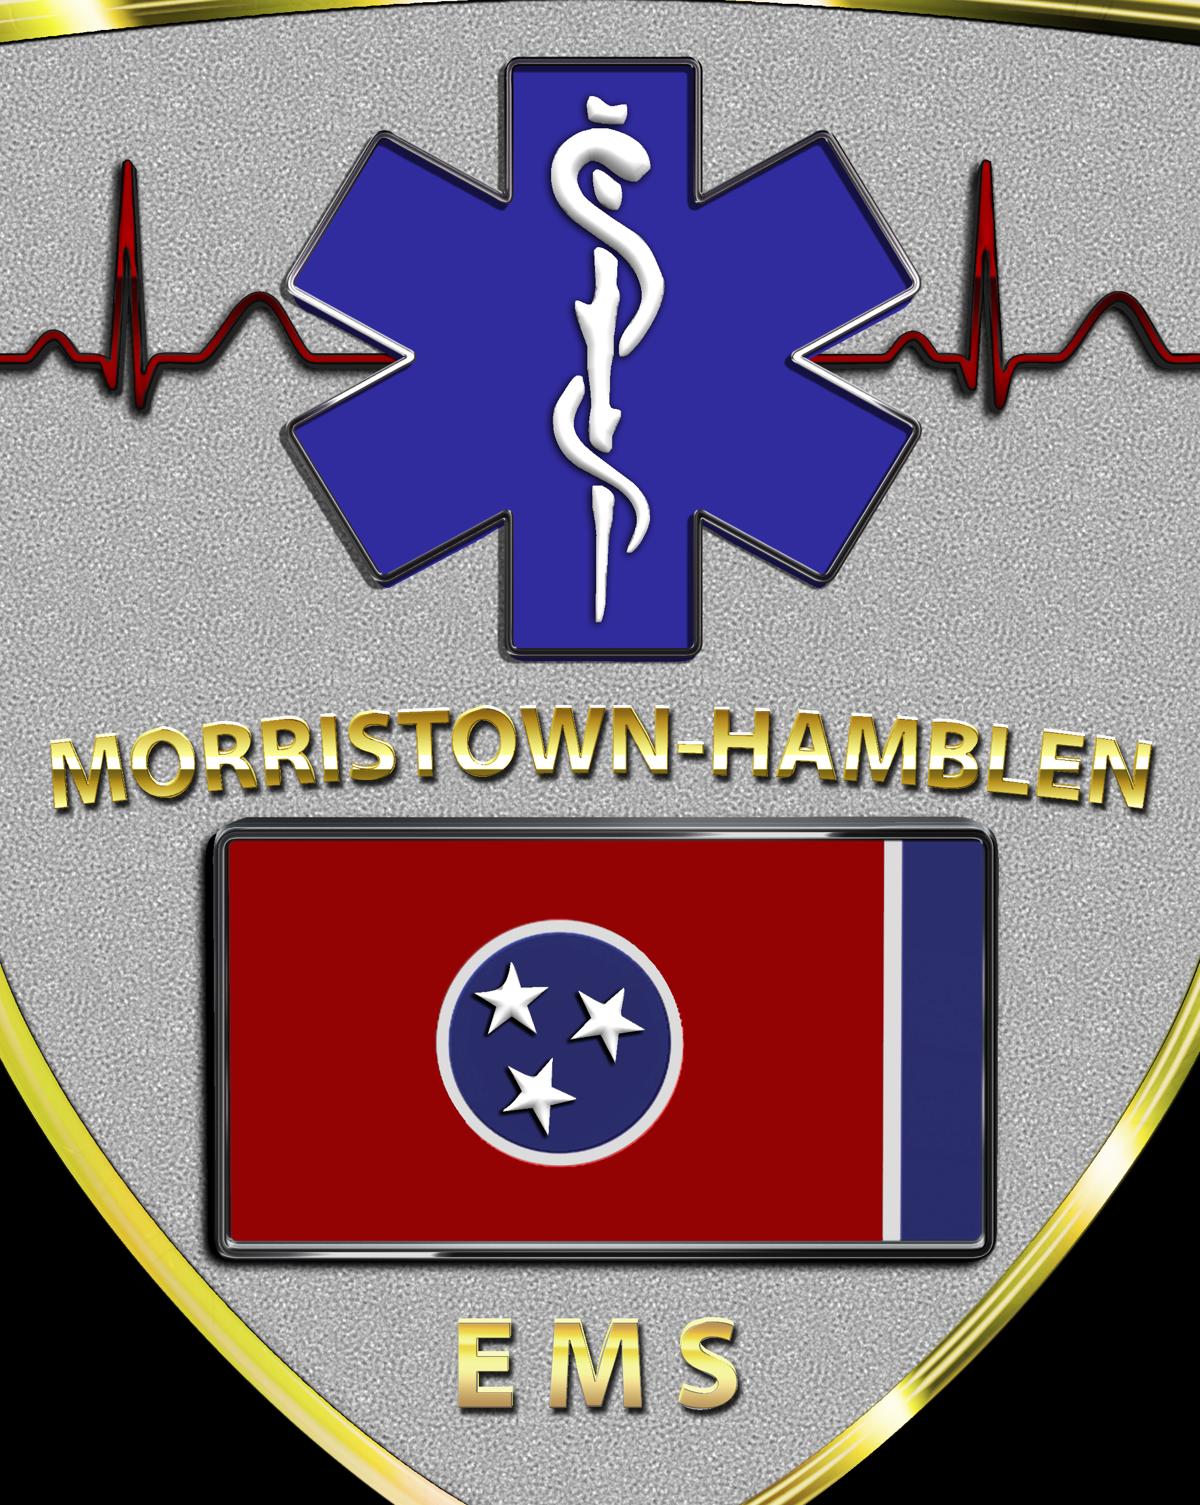 Paramedics and EMT/AEMTS Needed! image 1